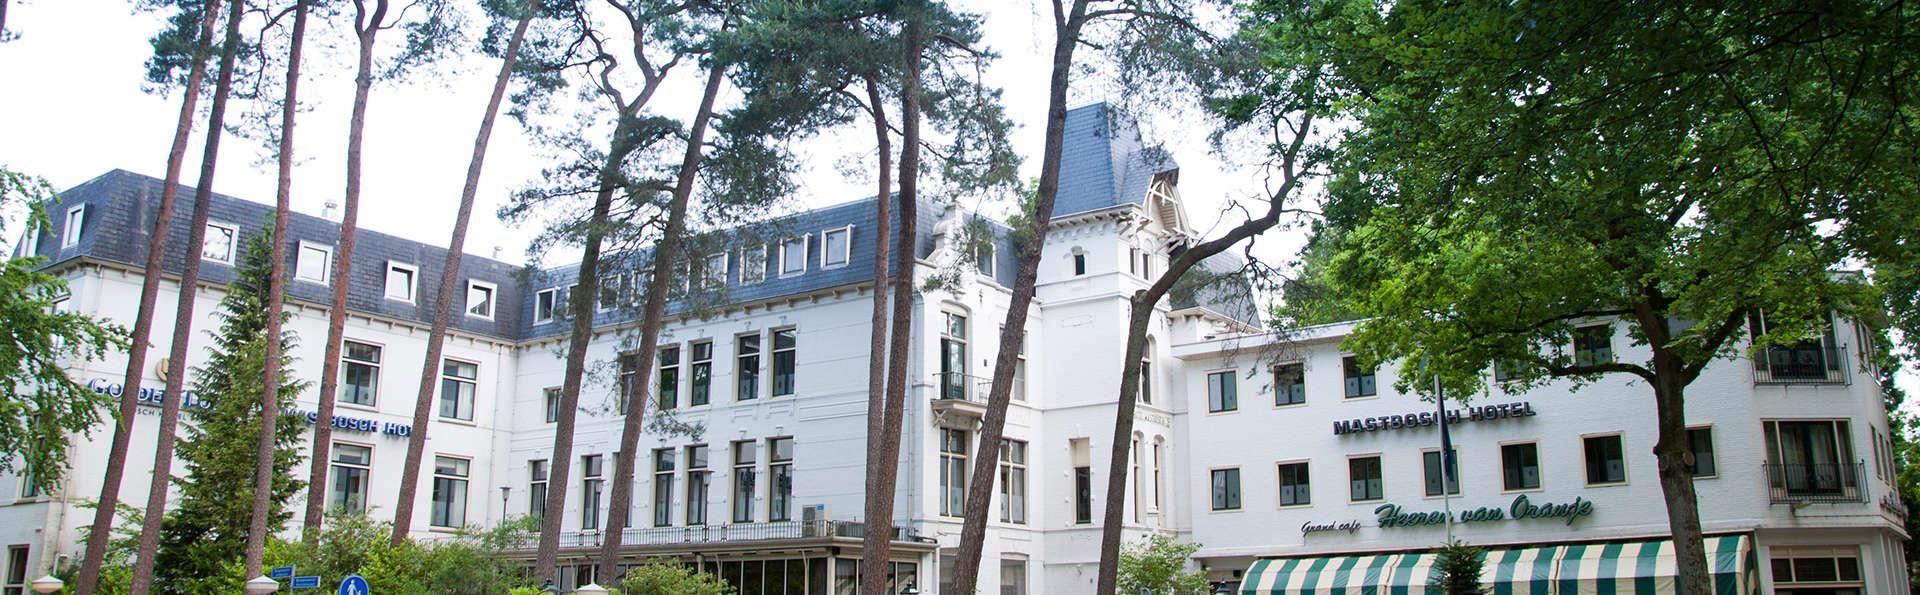 Hotel Mastbosch Breda - EDIT_front.jpg